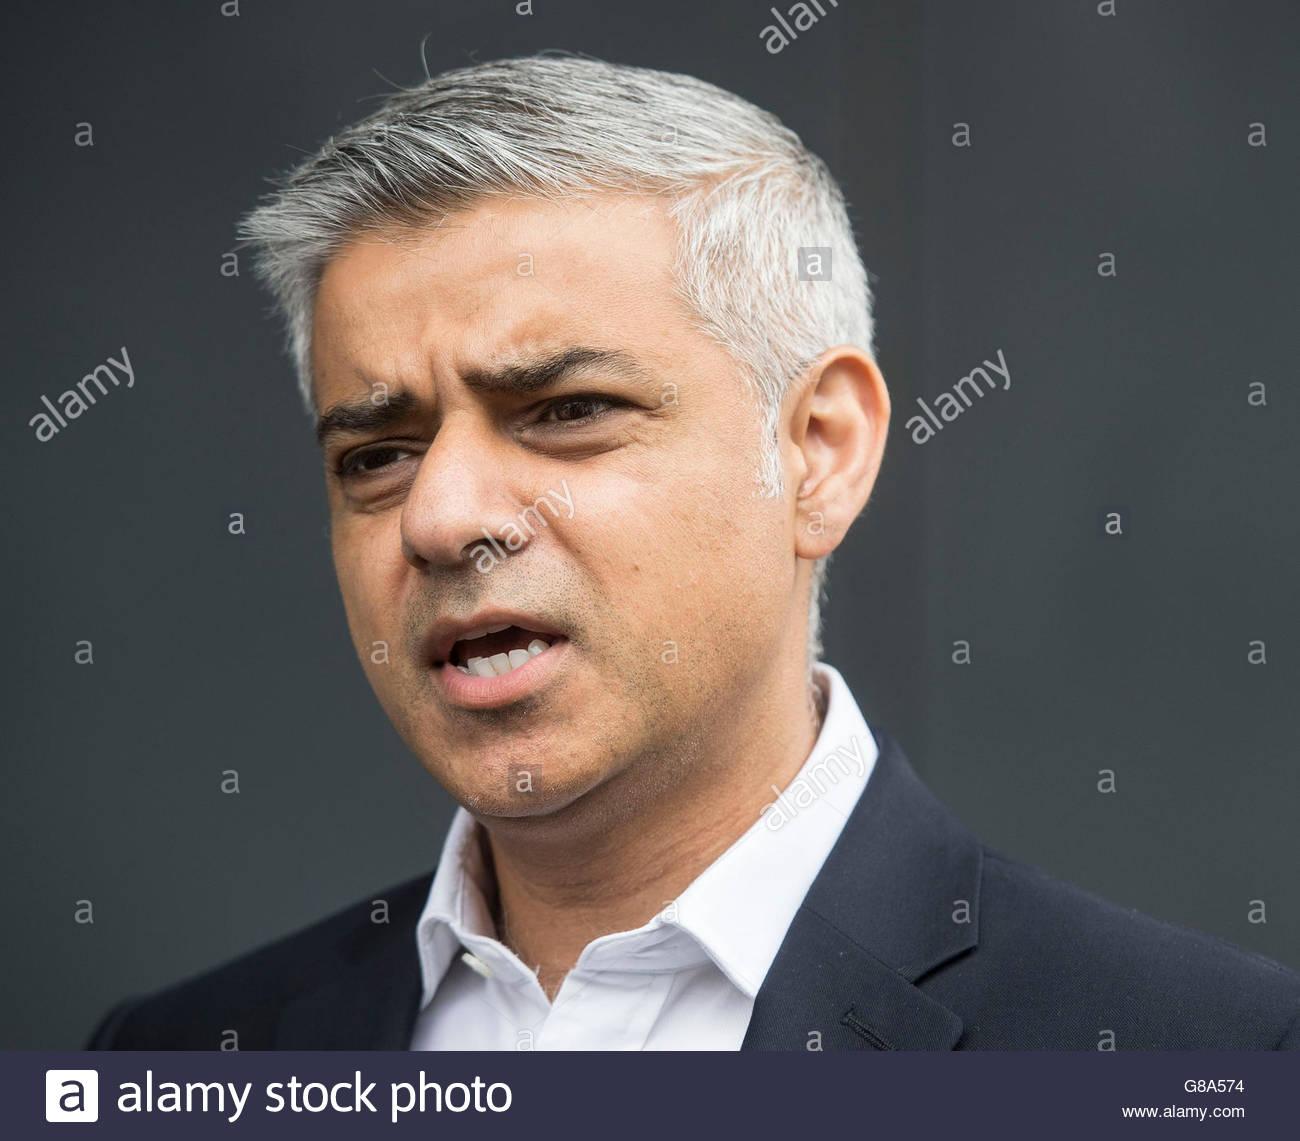 Foto de archivo de fecha 13/06/16 del Alcalde de Londres Sadiq Khan, quien ha dicho que Gran Bretaña no debería Imagen De Stock